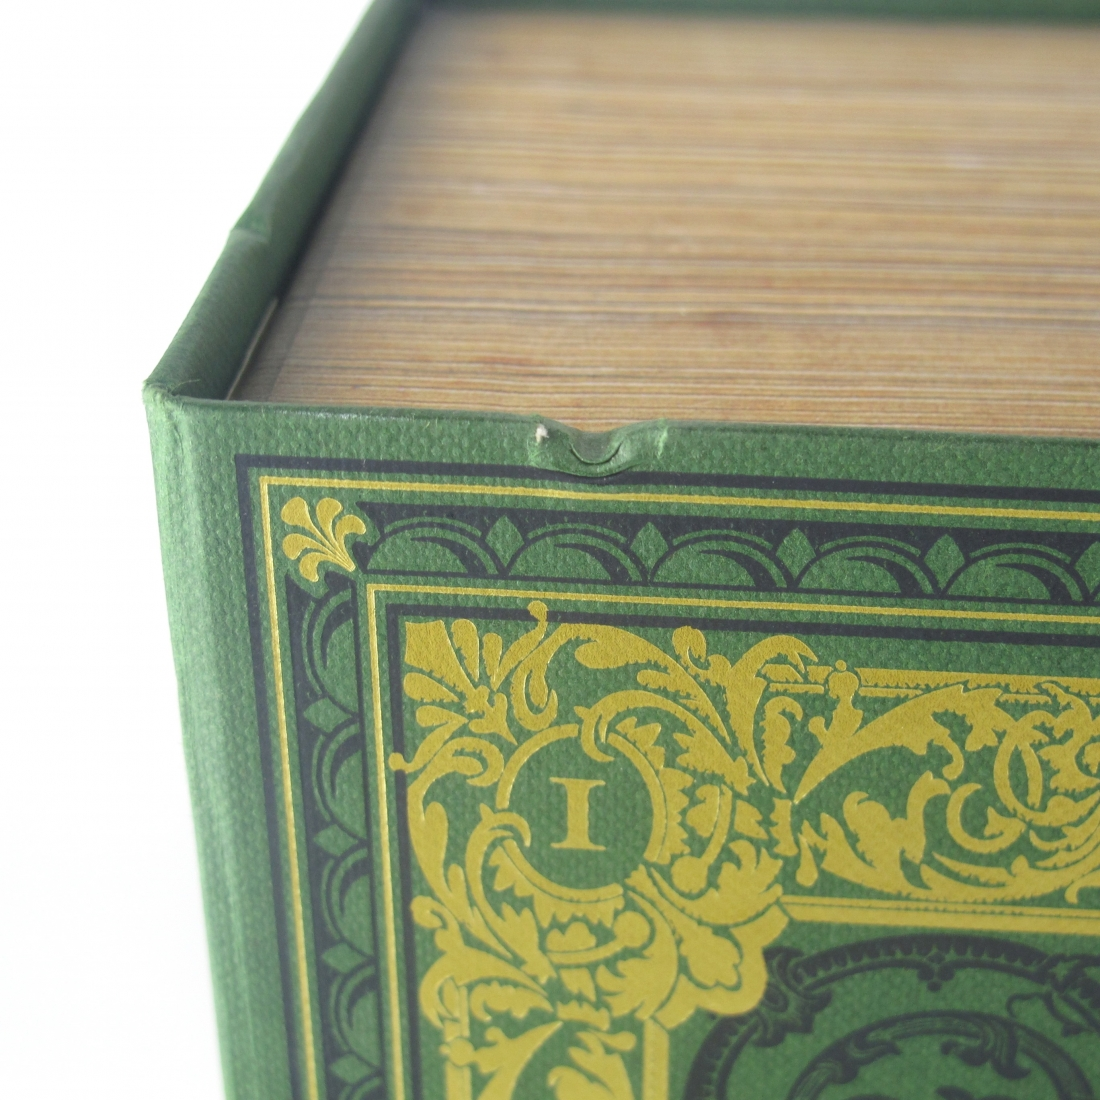 Arran Smugglers' Series Volume 1 75cl / The Illicit Stills US Import